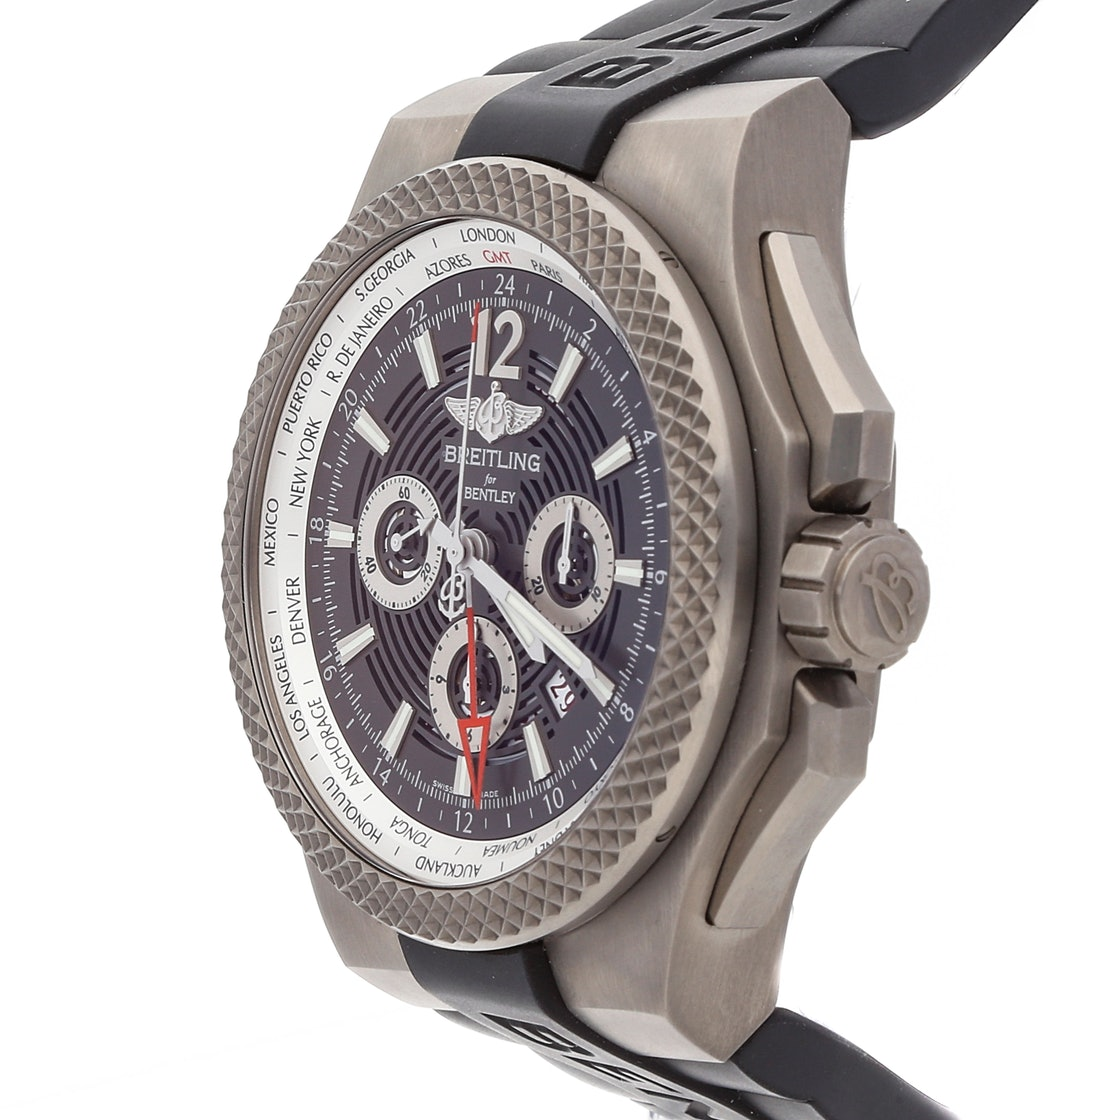 Breitling Bentley GMT Light Body Chronograph EB043210/M533